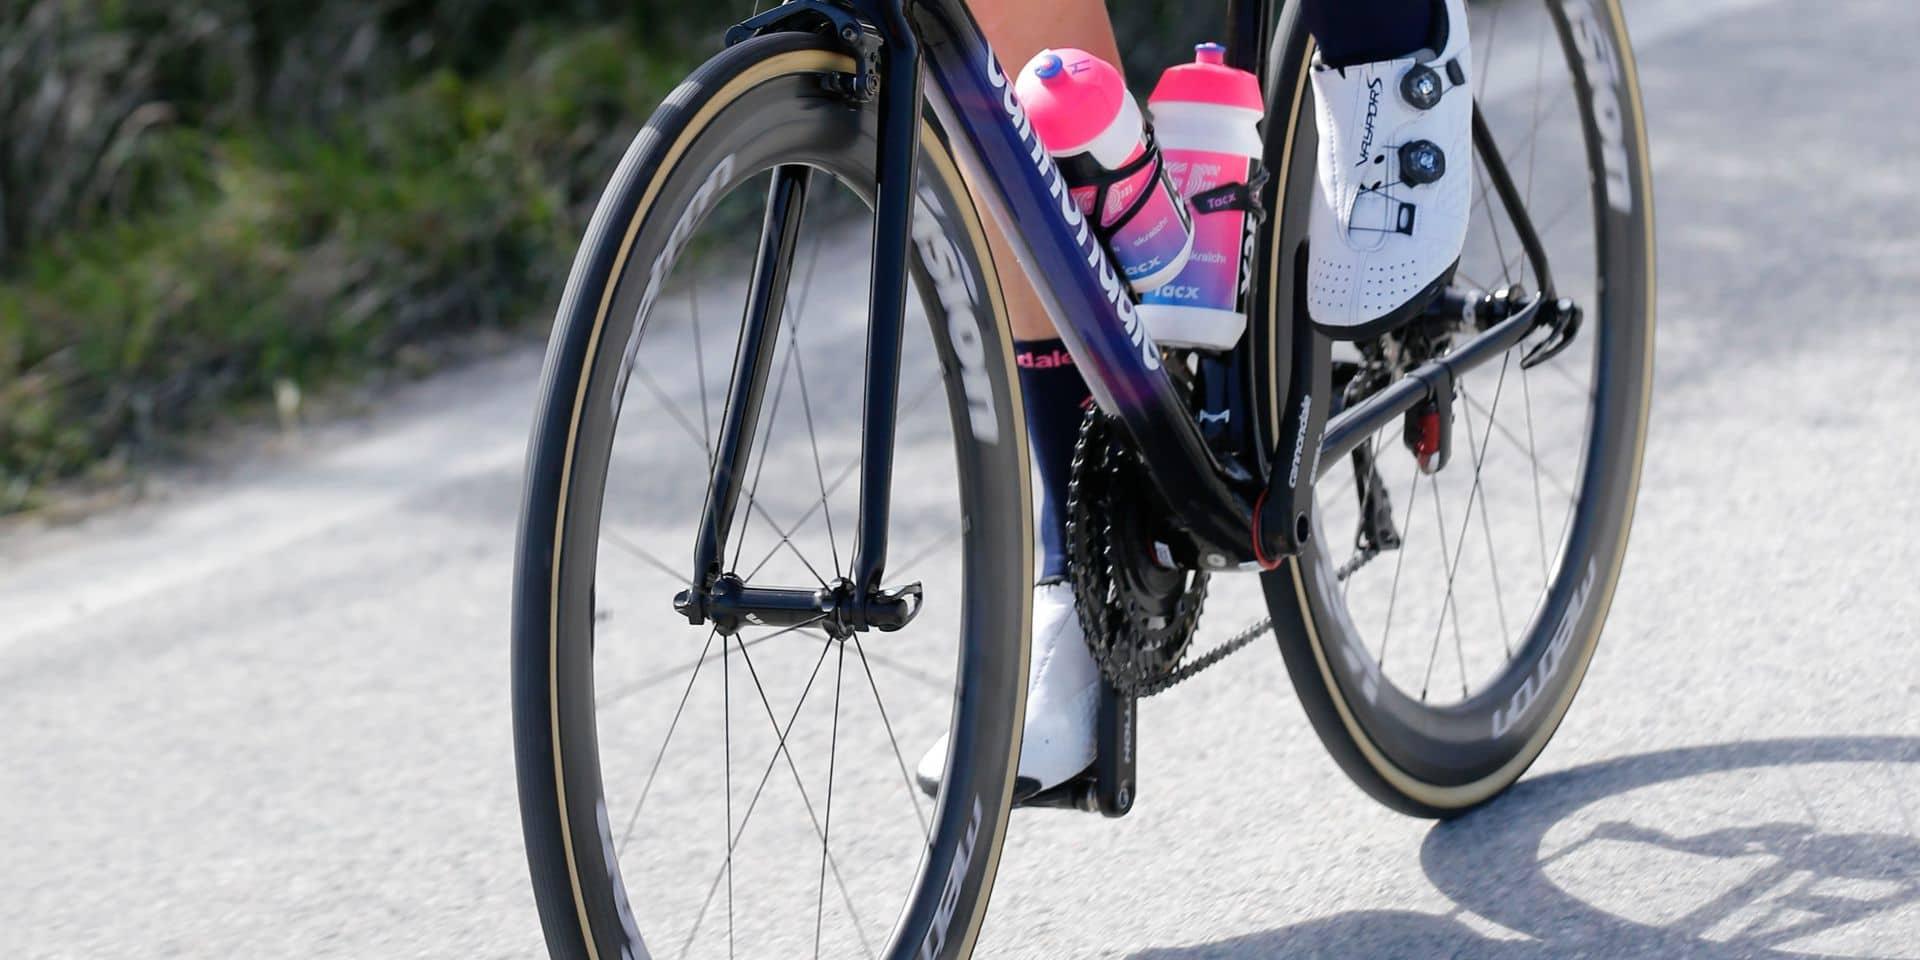 Une moto tombe sur un coureur en pleine ascension à Tirreno-Adriatico